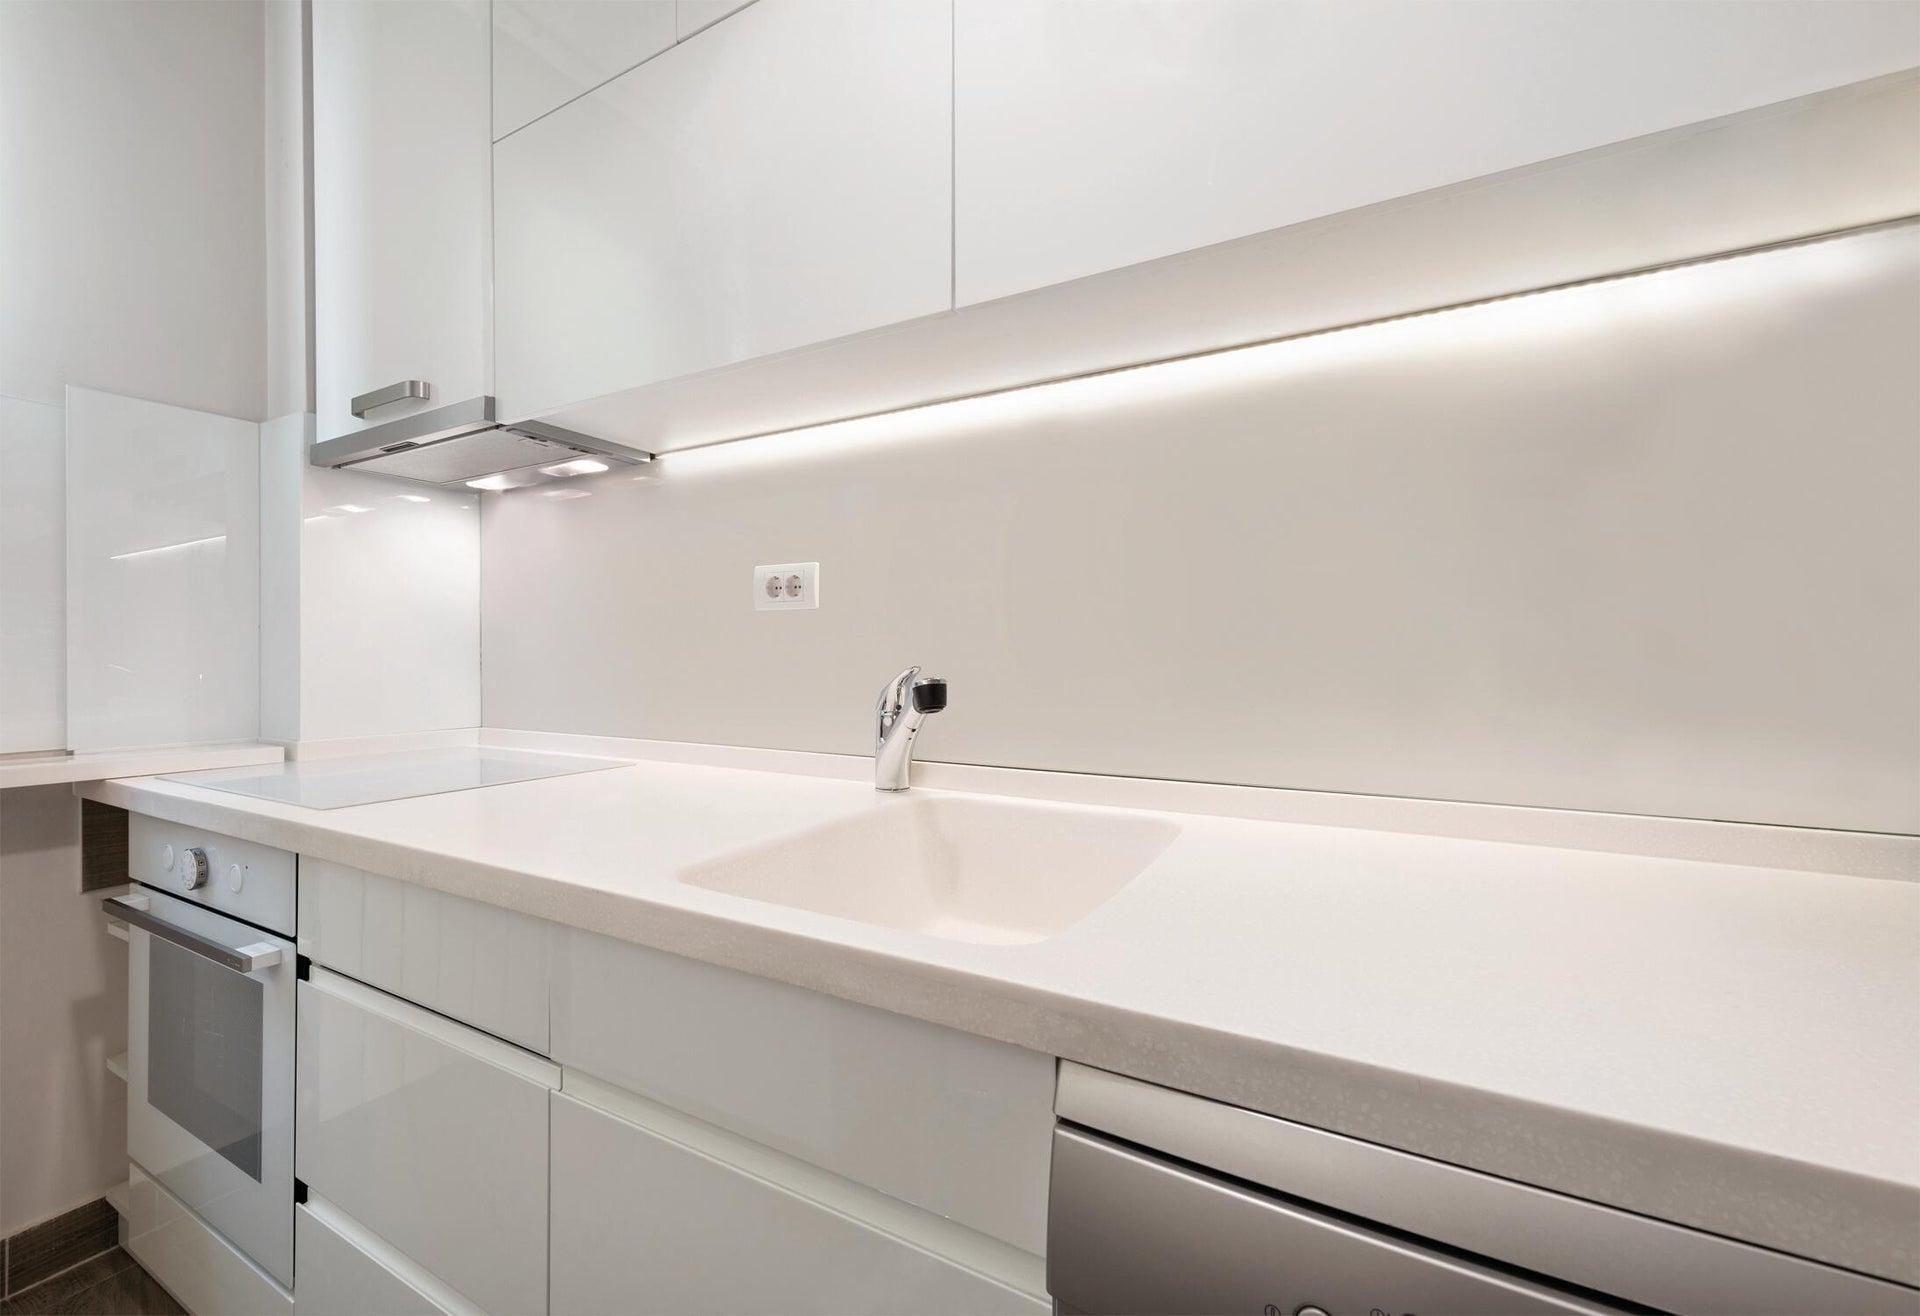 Striscia led Noname 1.5m luce cct regolazione da bianco caldo a bianco freddo 400LM IP20 INSPIRE - 6